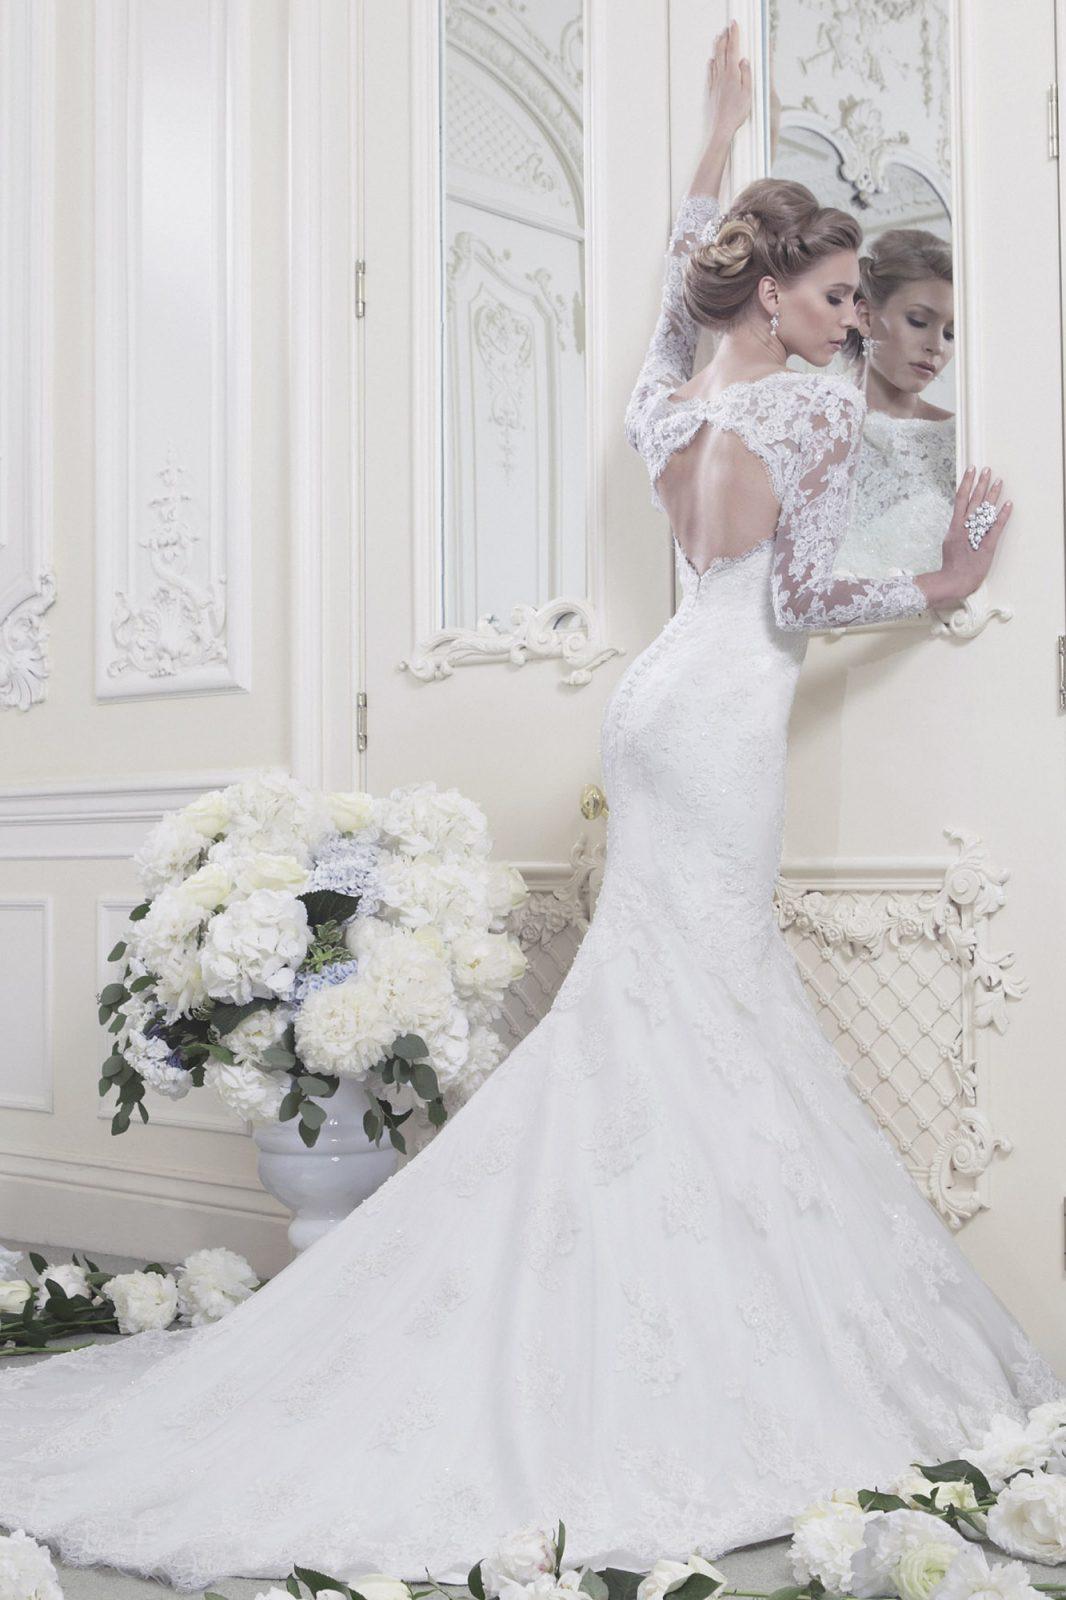 Ellis bridals ellis 2016 wedding dress 11368 ellis bridals fishtail with statement back style 11368 ombrellifo Choice Image